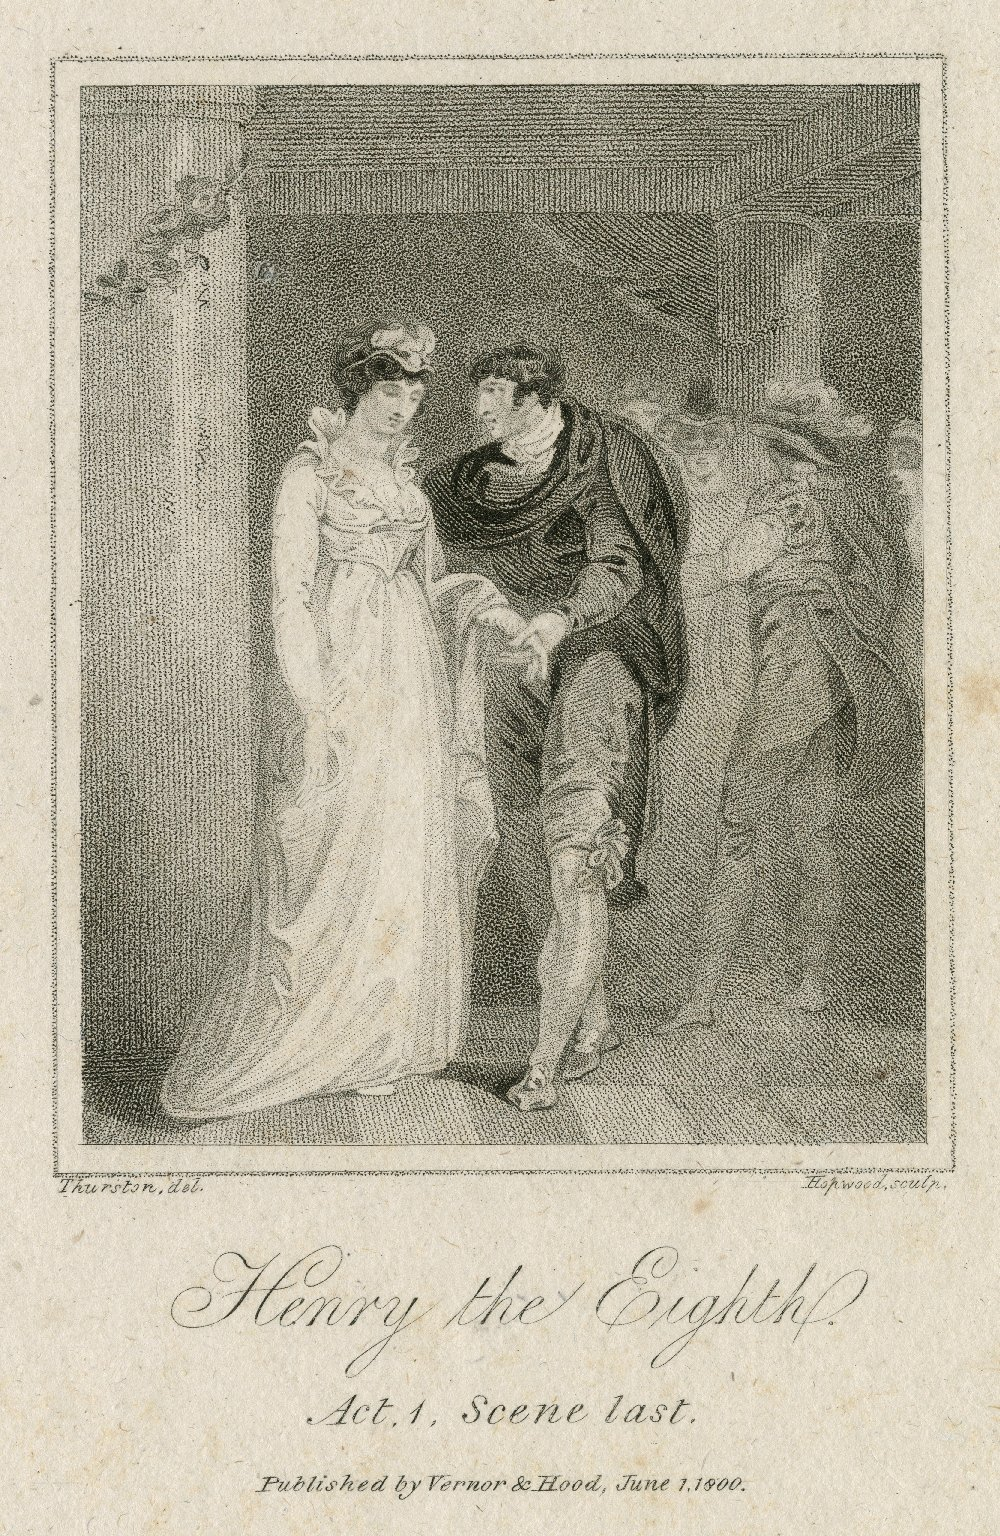 Henry the Eighth, act 1, scene 1st [i.e. 4] [graphic] / Thurston del. ; Hopwood sculp.